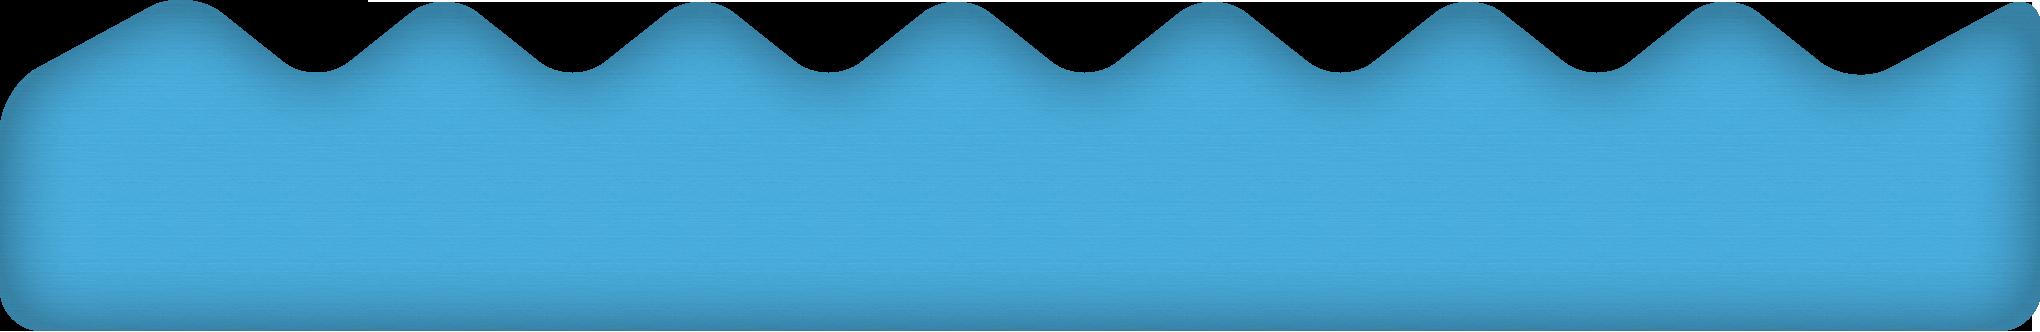 Moving website graphics kent